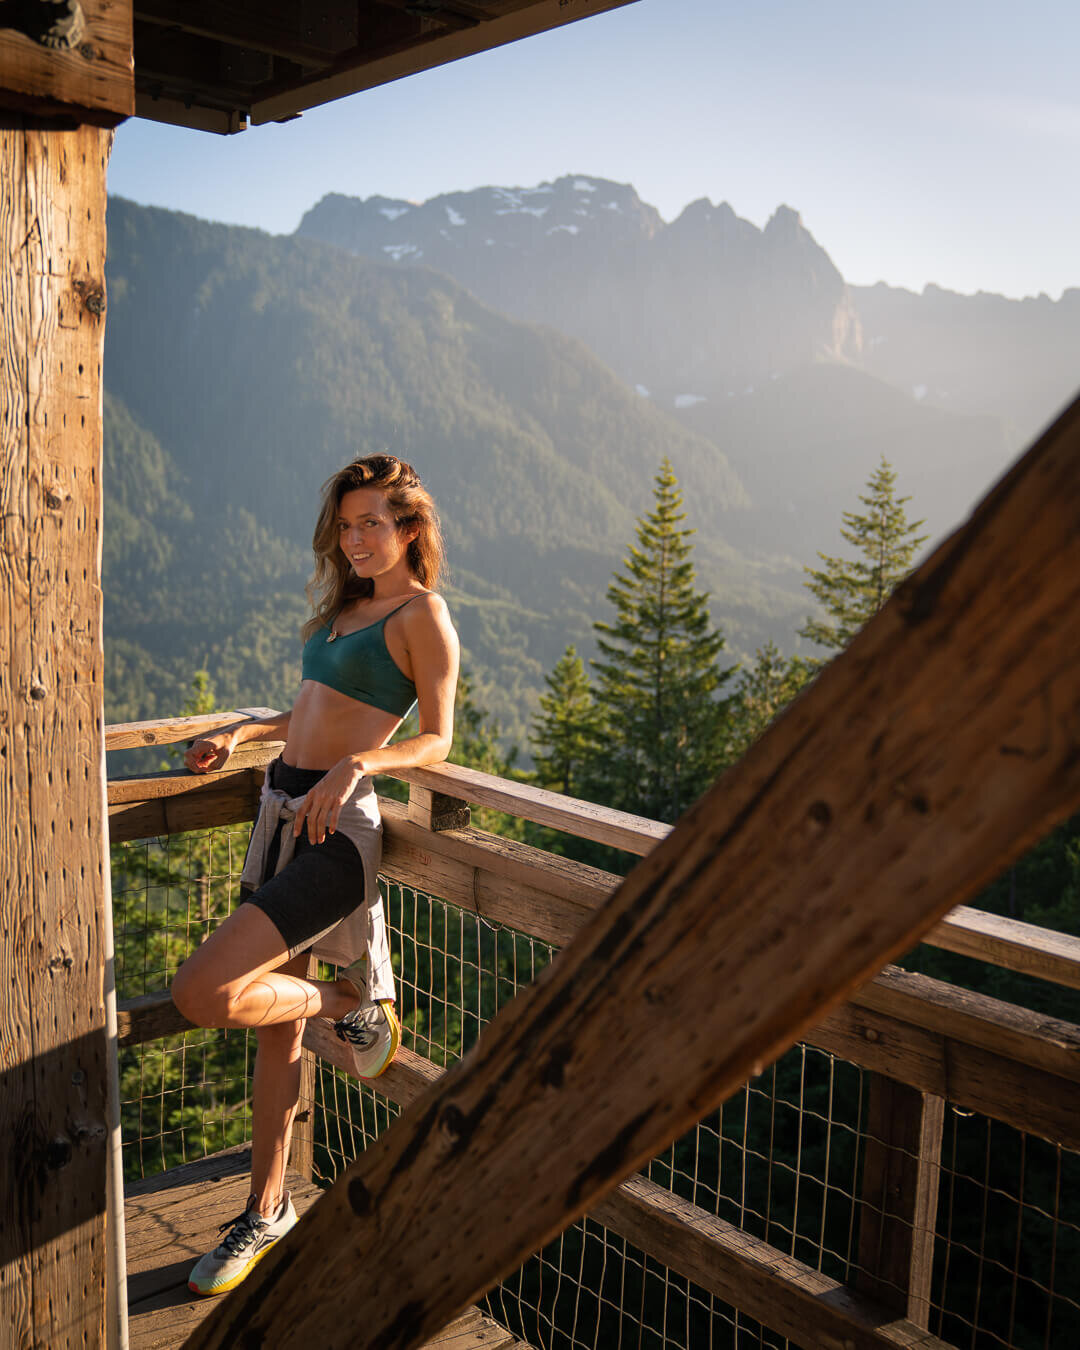 Heybrook Lookout at sunset. Wearing: Nike  Trail Running Shoes , Beyond Yoga  Biker Shorts , Patagonia  Bra , The North Face  HyperLayer Long Sleeve ,.